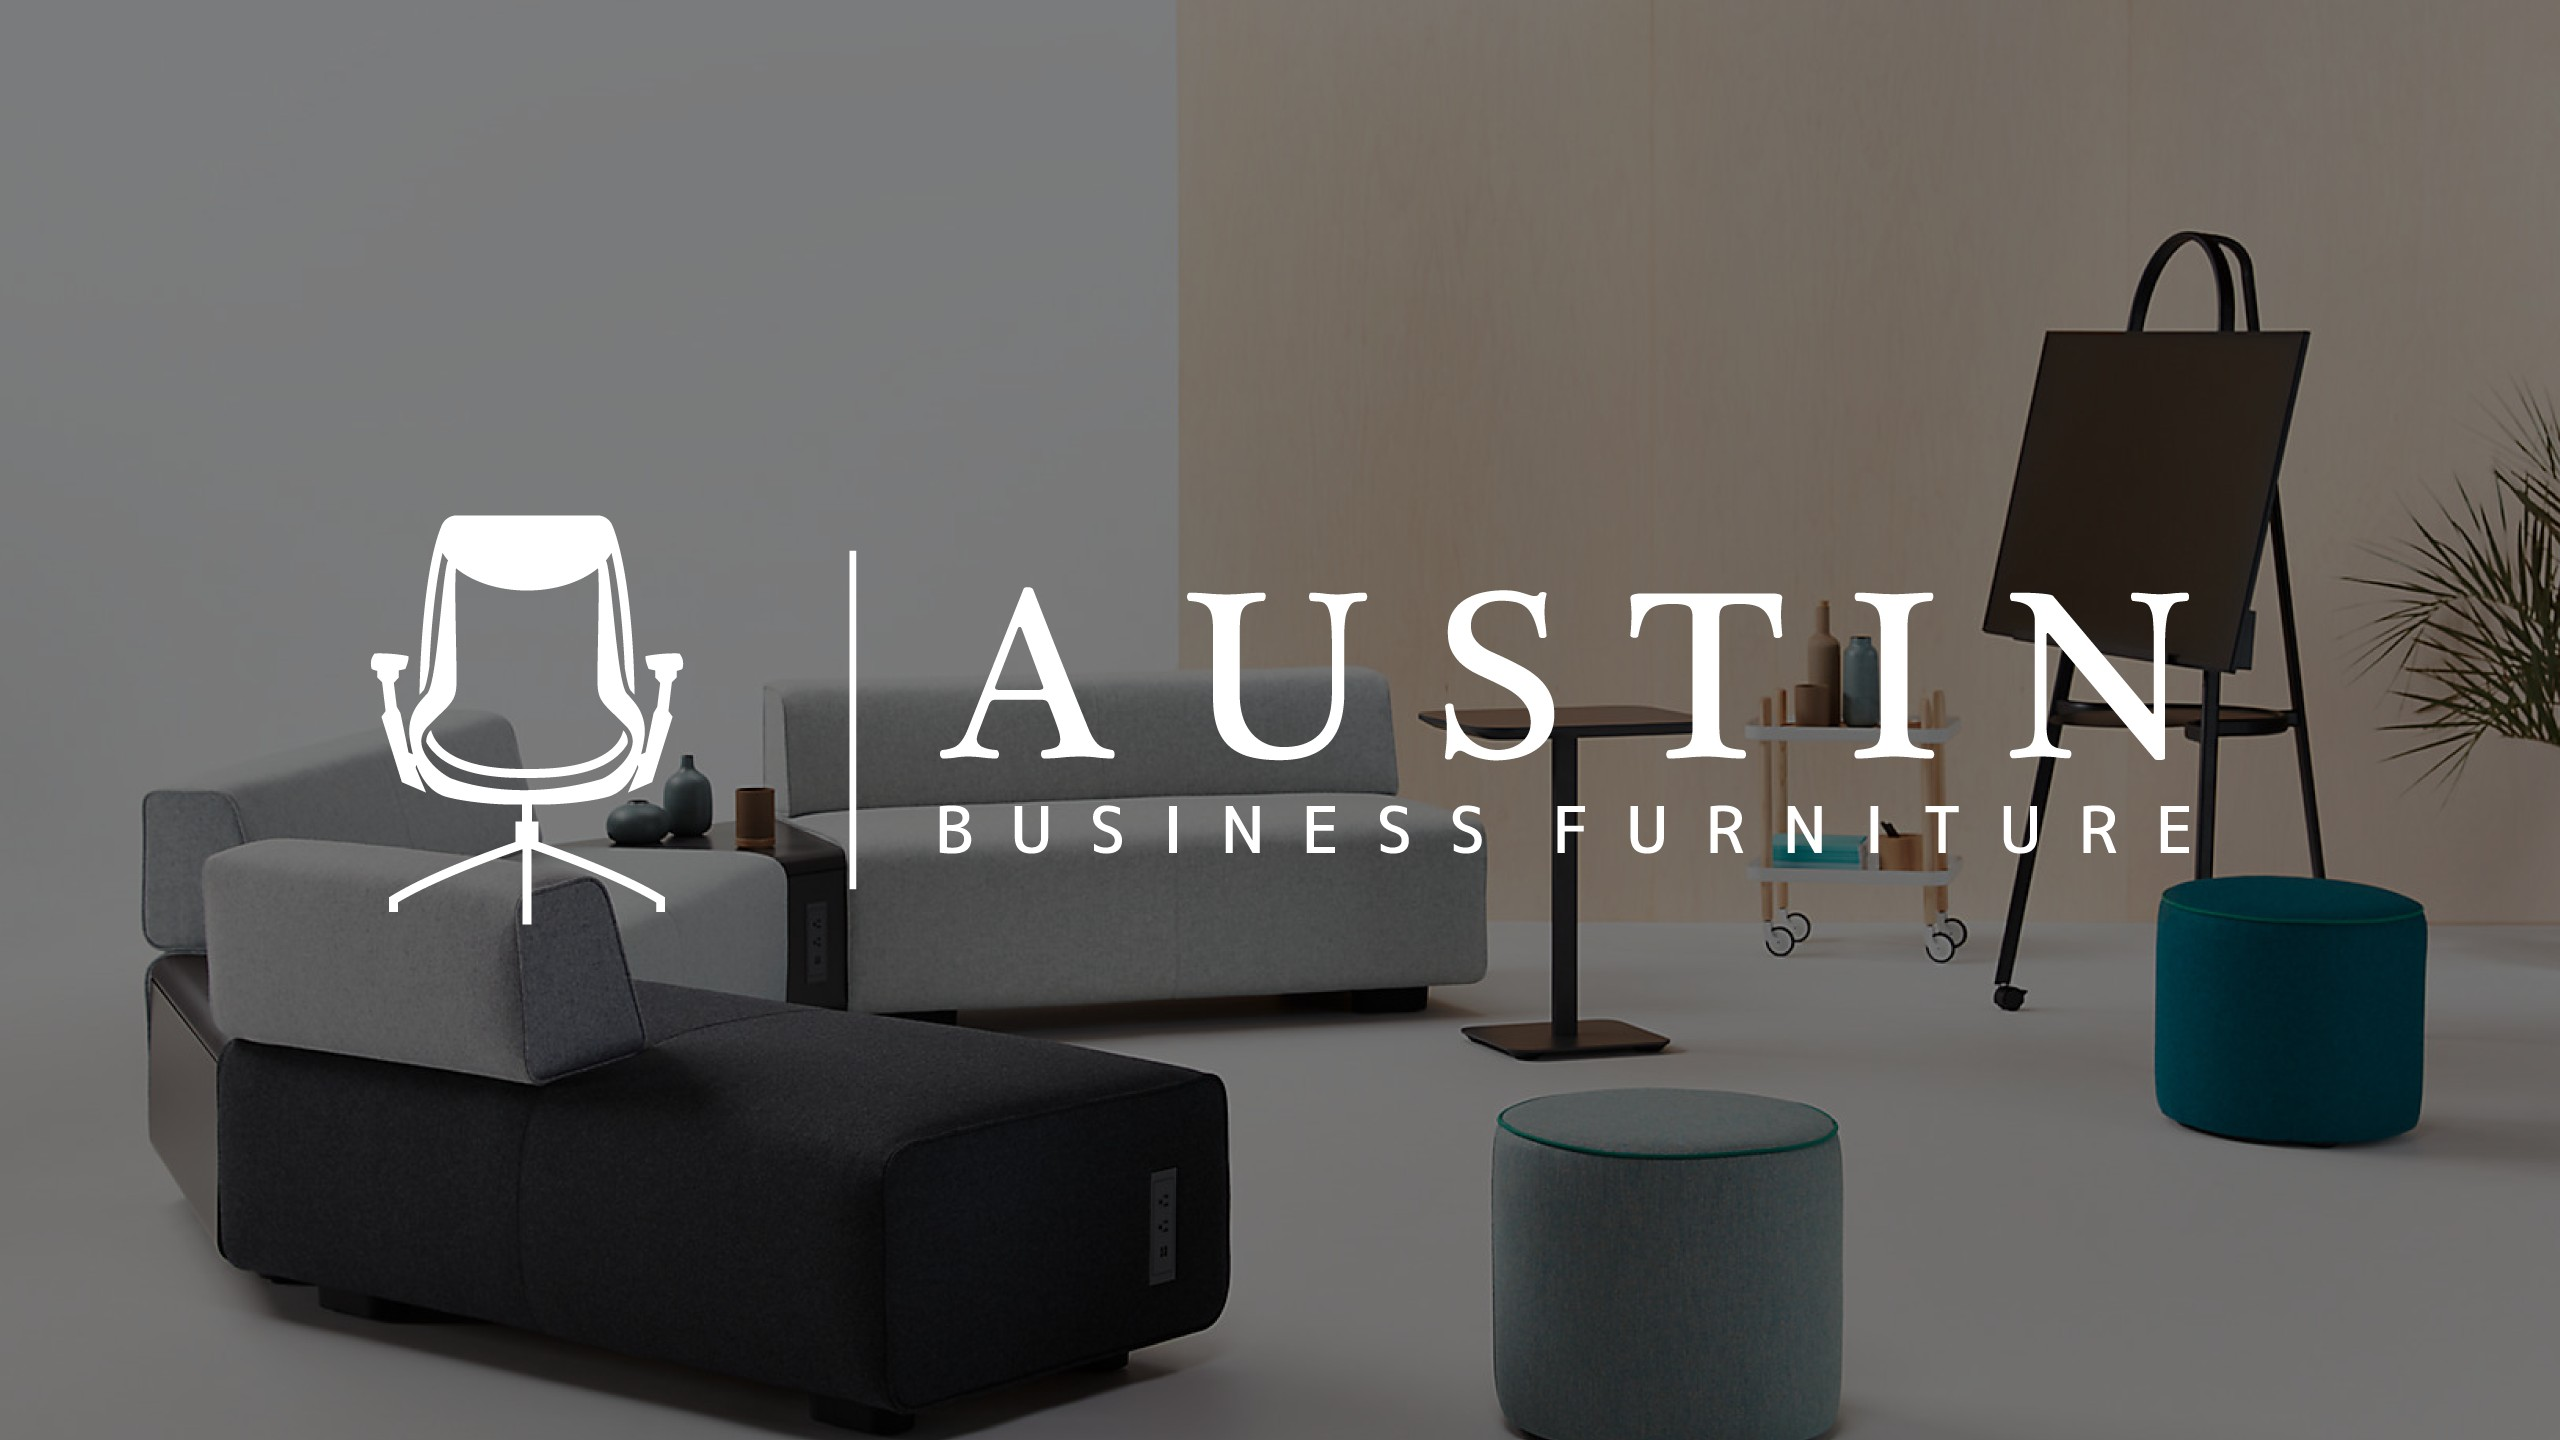 Austin Business Furniture Linkedin